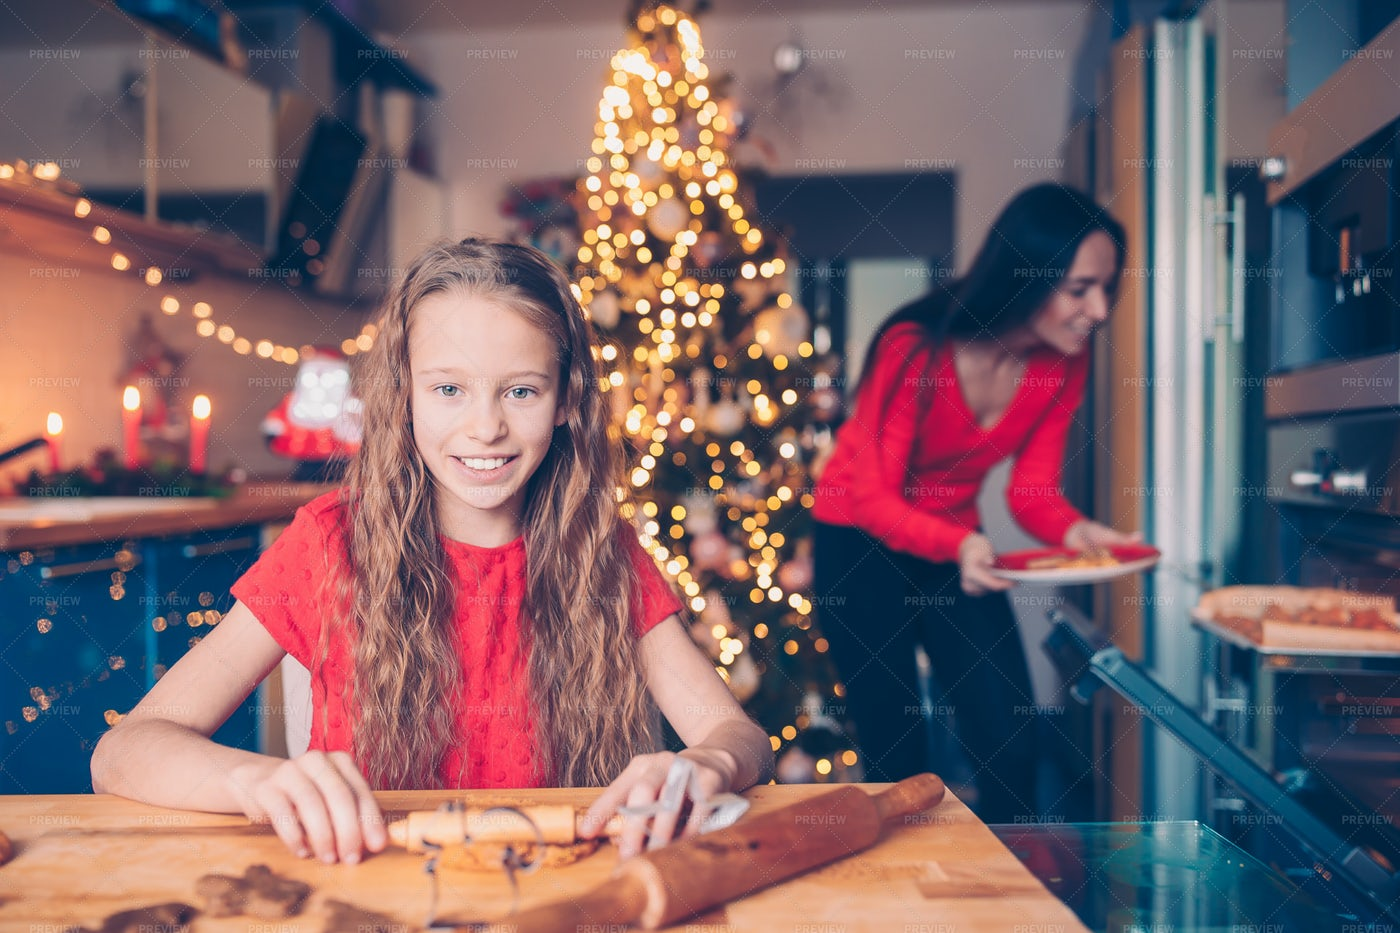 Girl Baking Cookies On Christmas: Stock Photos